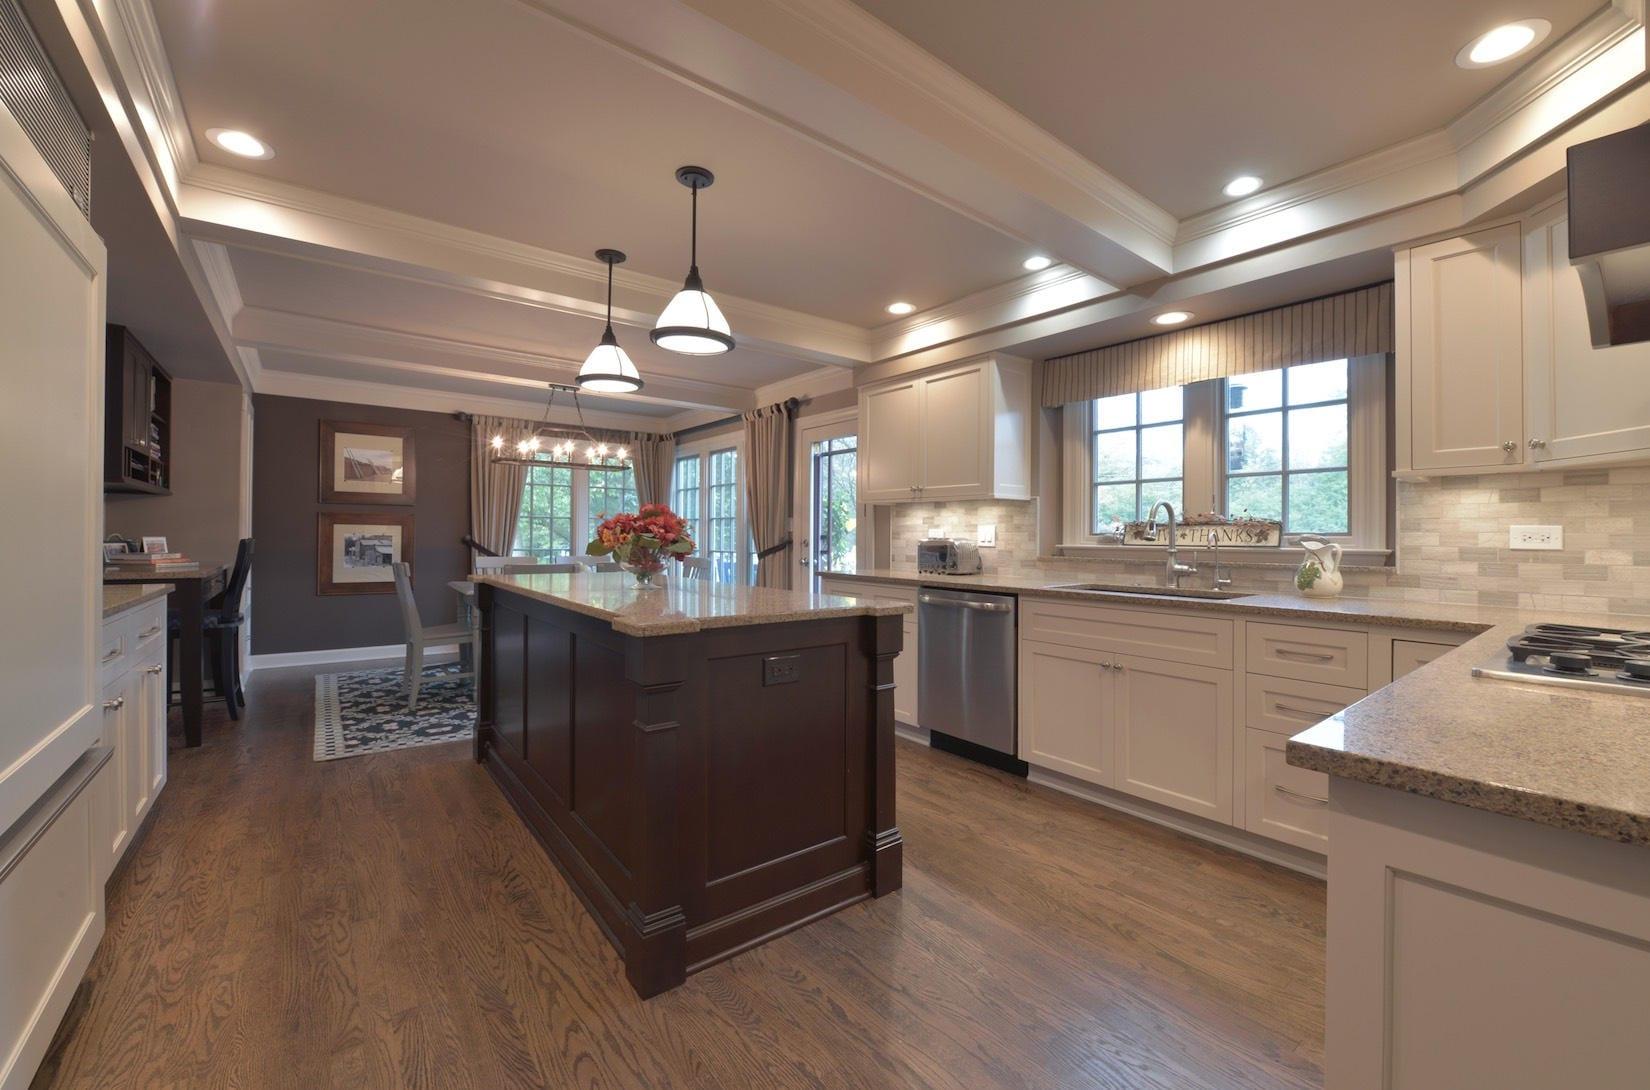 Interior Design Consultation Services | Kitchen Design & Build